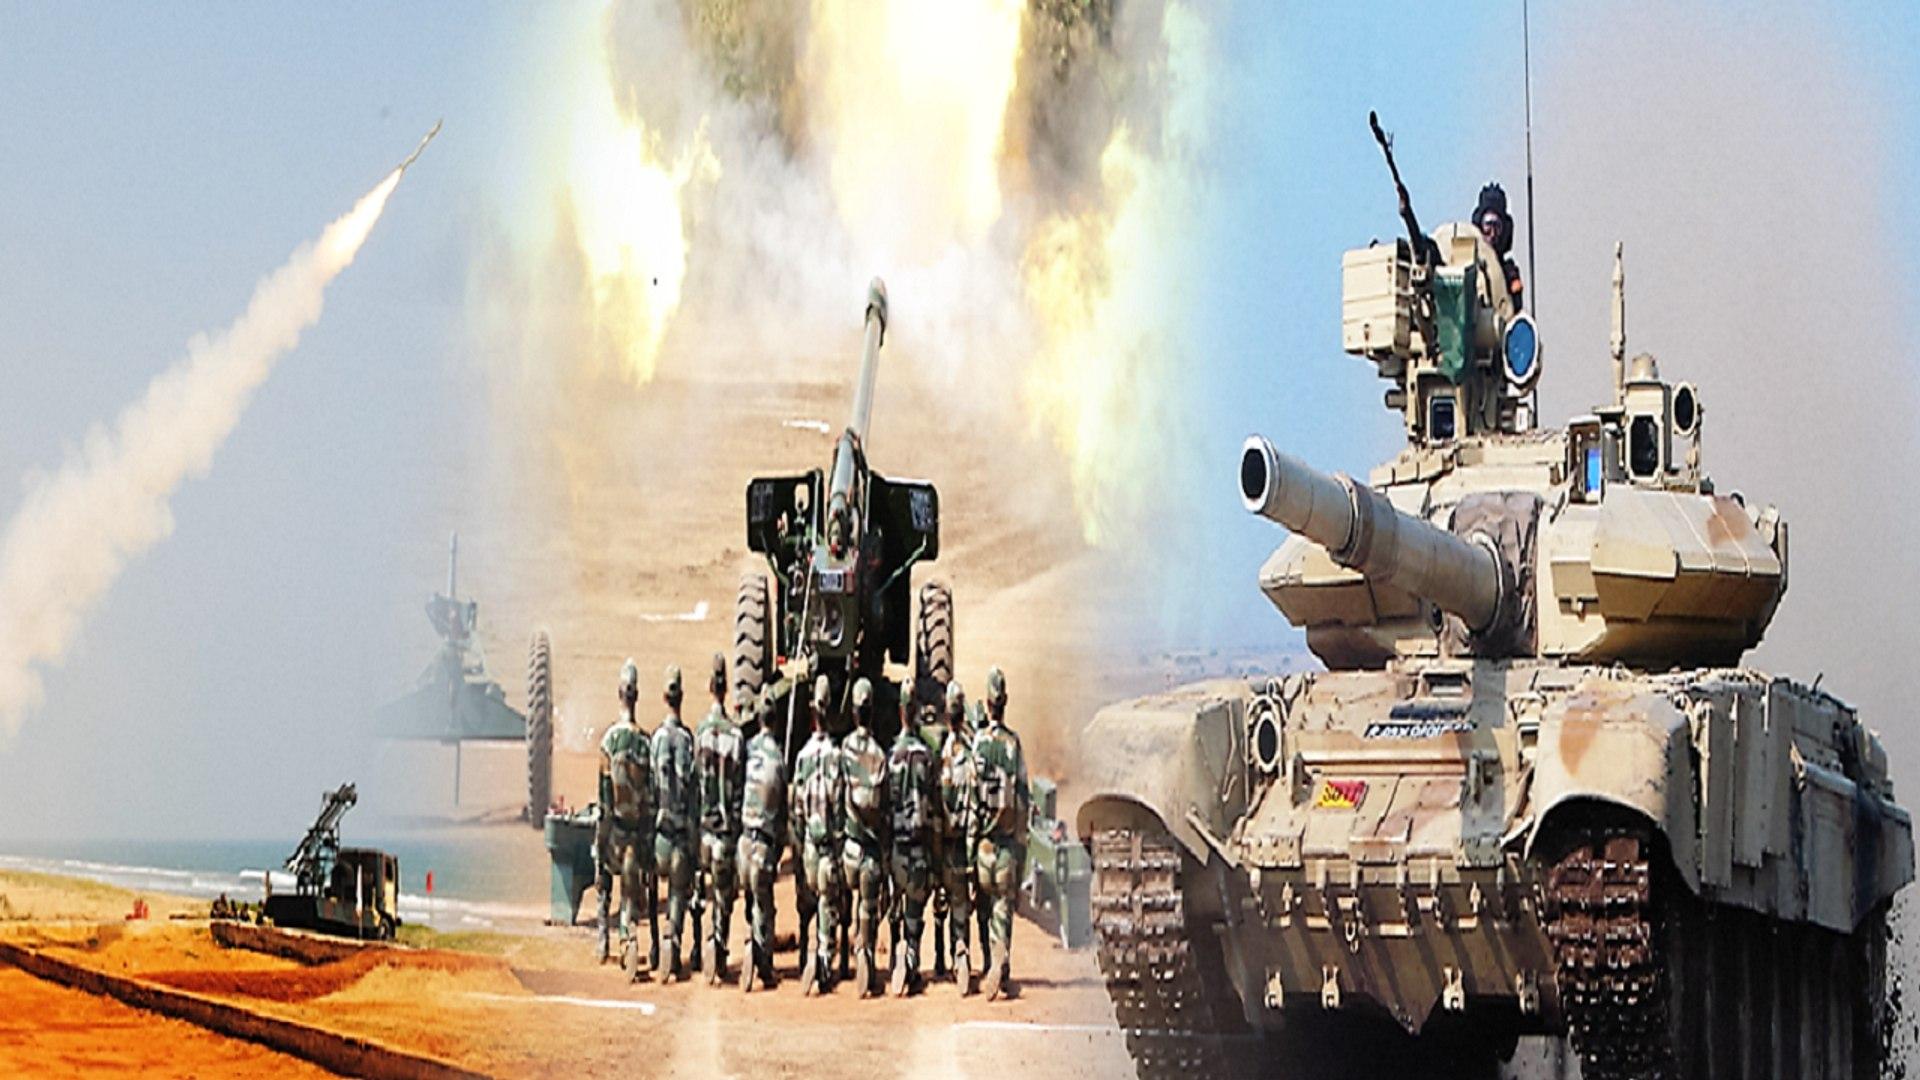 Bangladesh Army Official video 2017 | Bangladesh Military Official Video 2017 | Army Promo Video | L